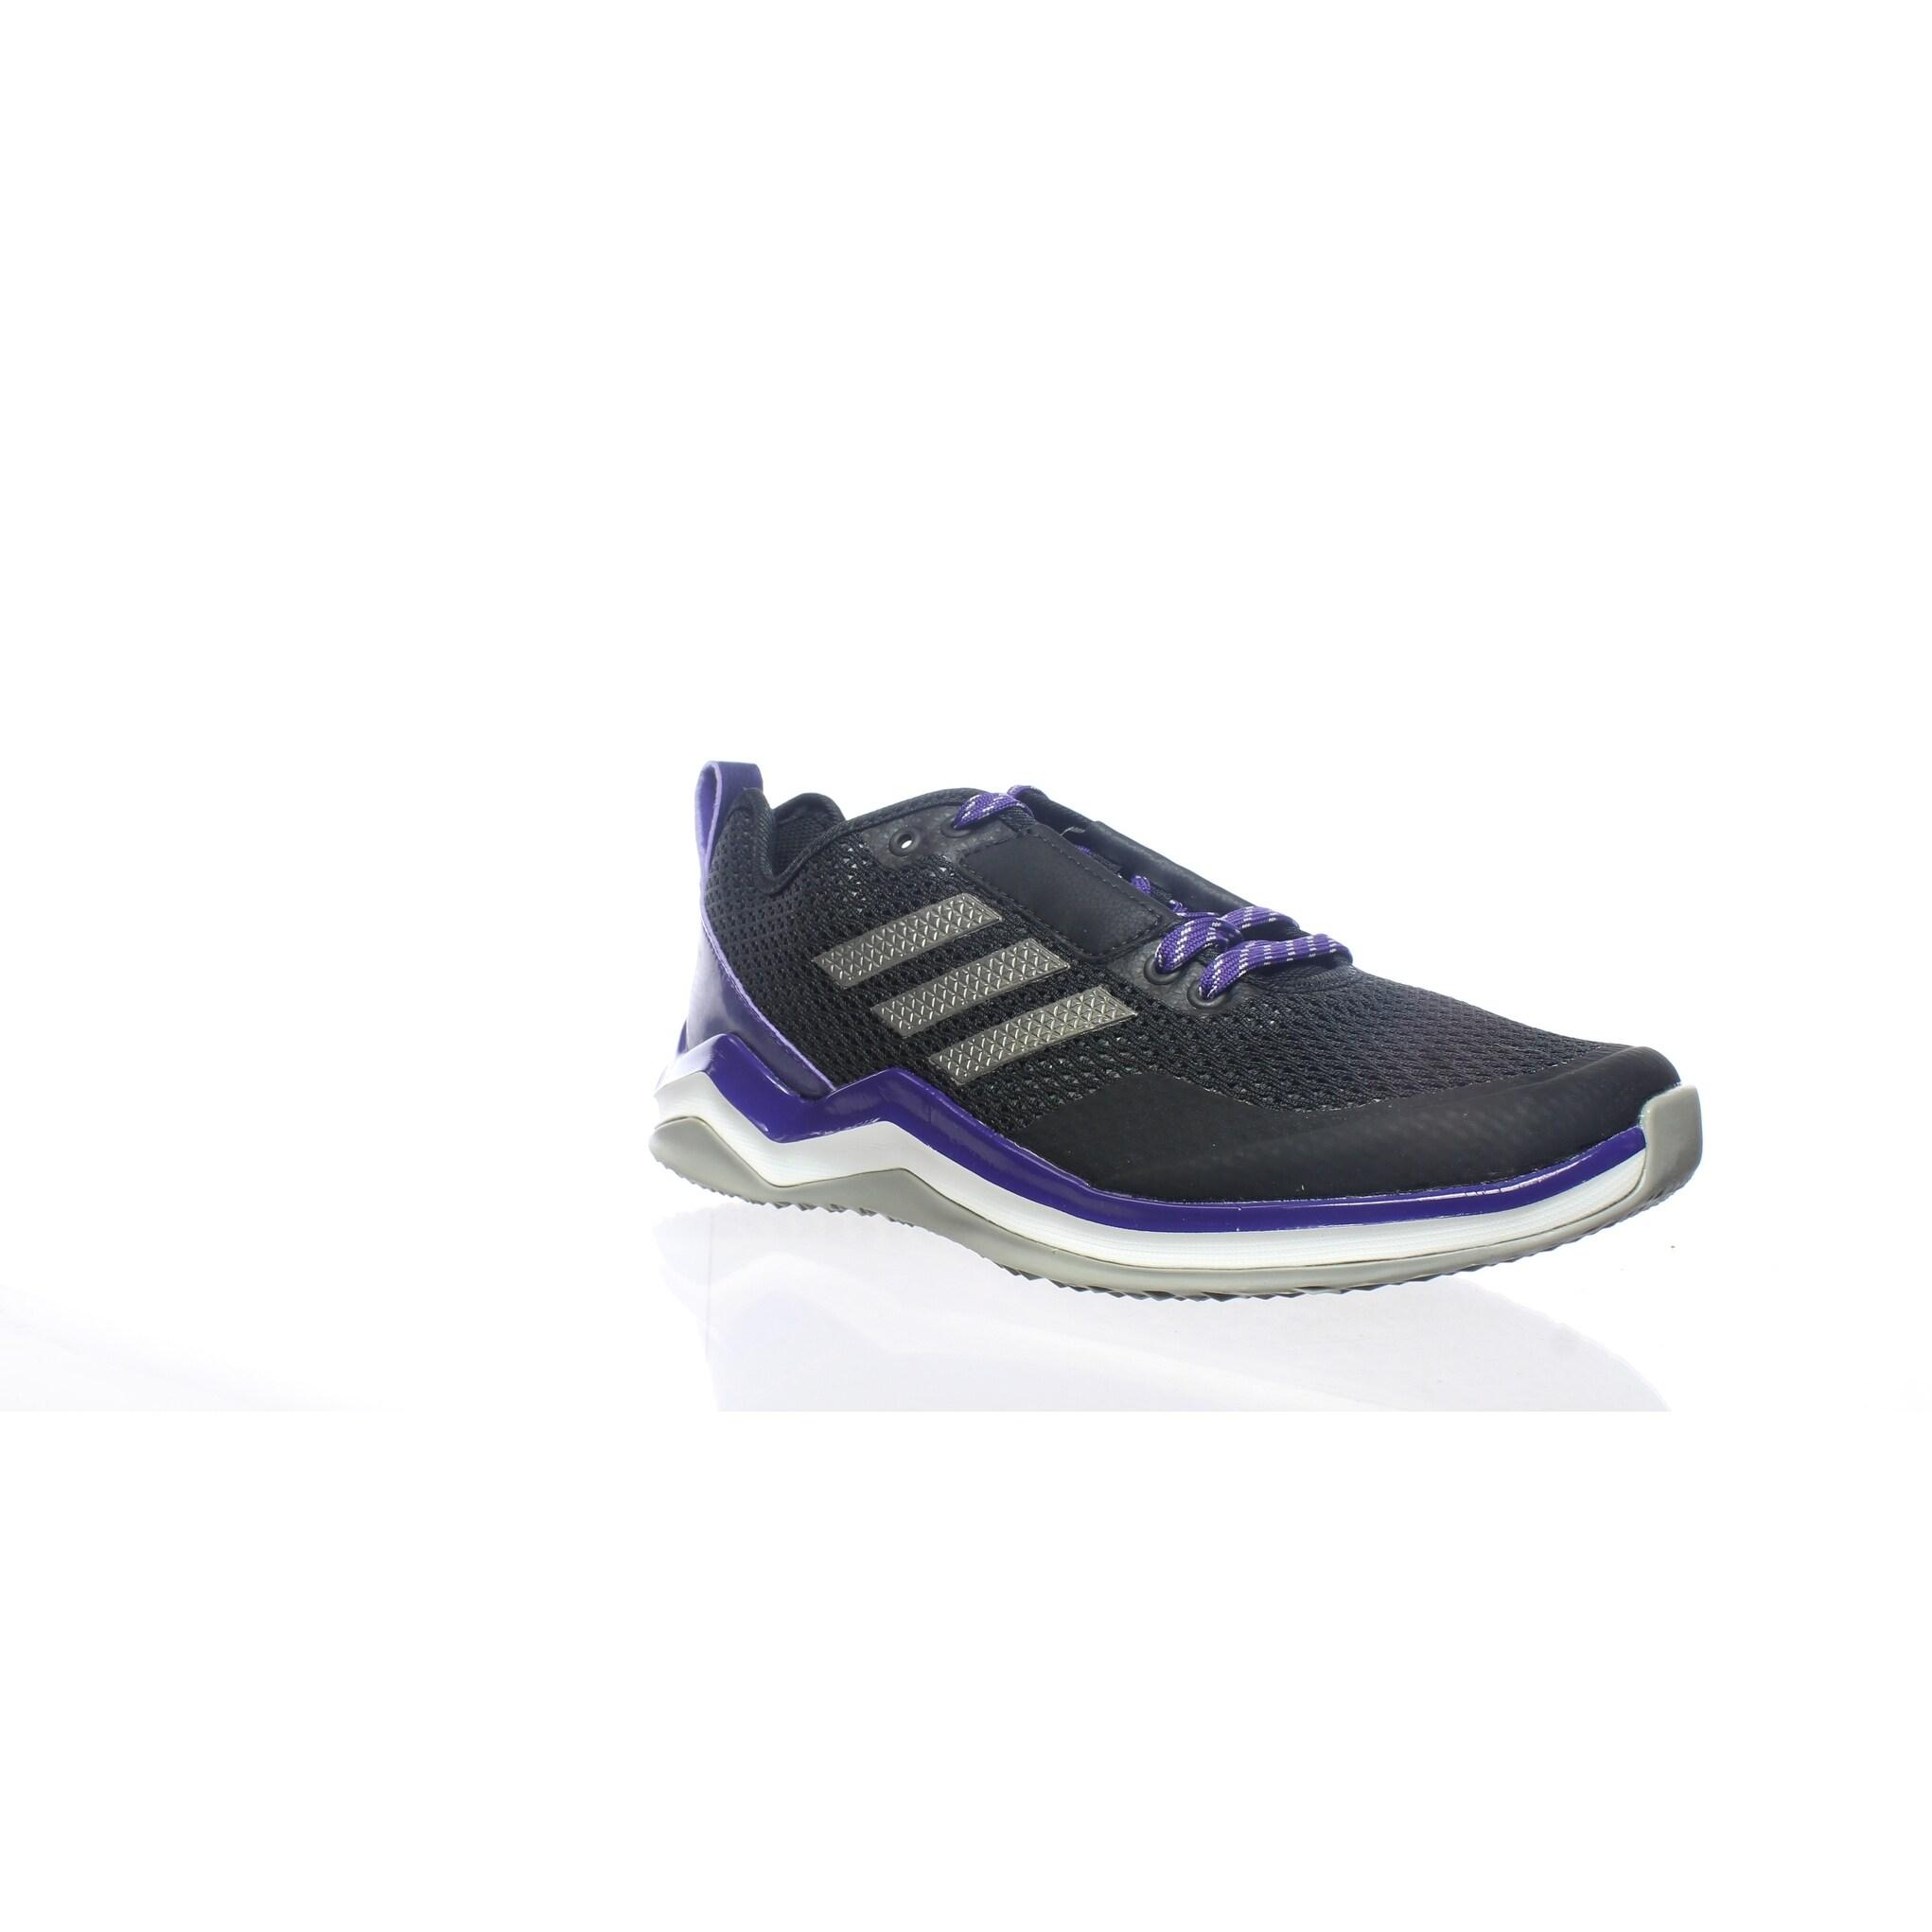 Adidas Mens Speed Trainer 3.0 Black